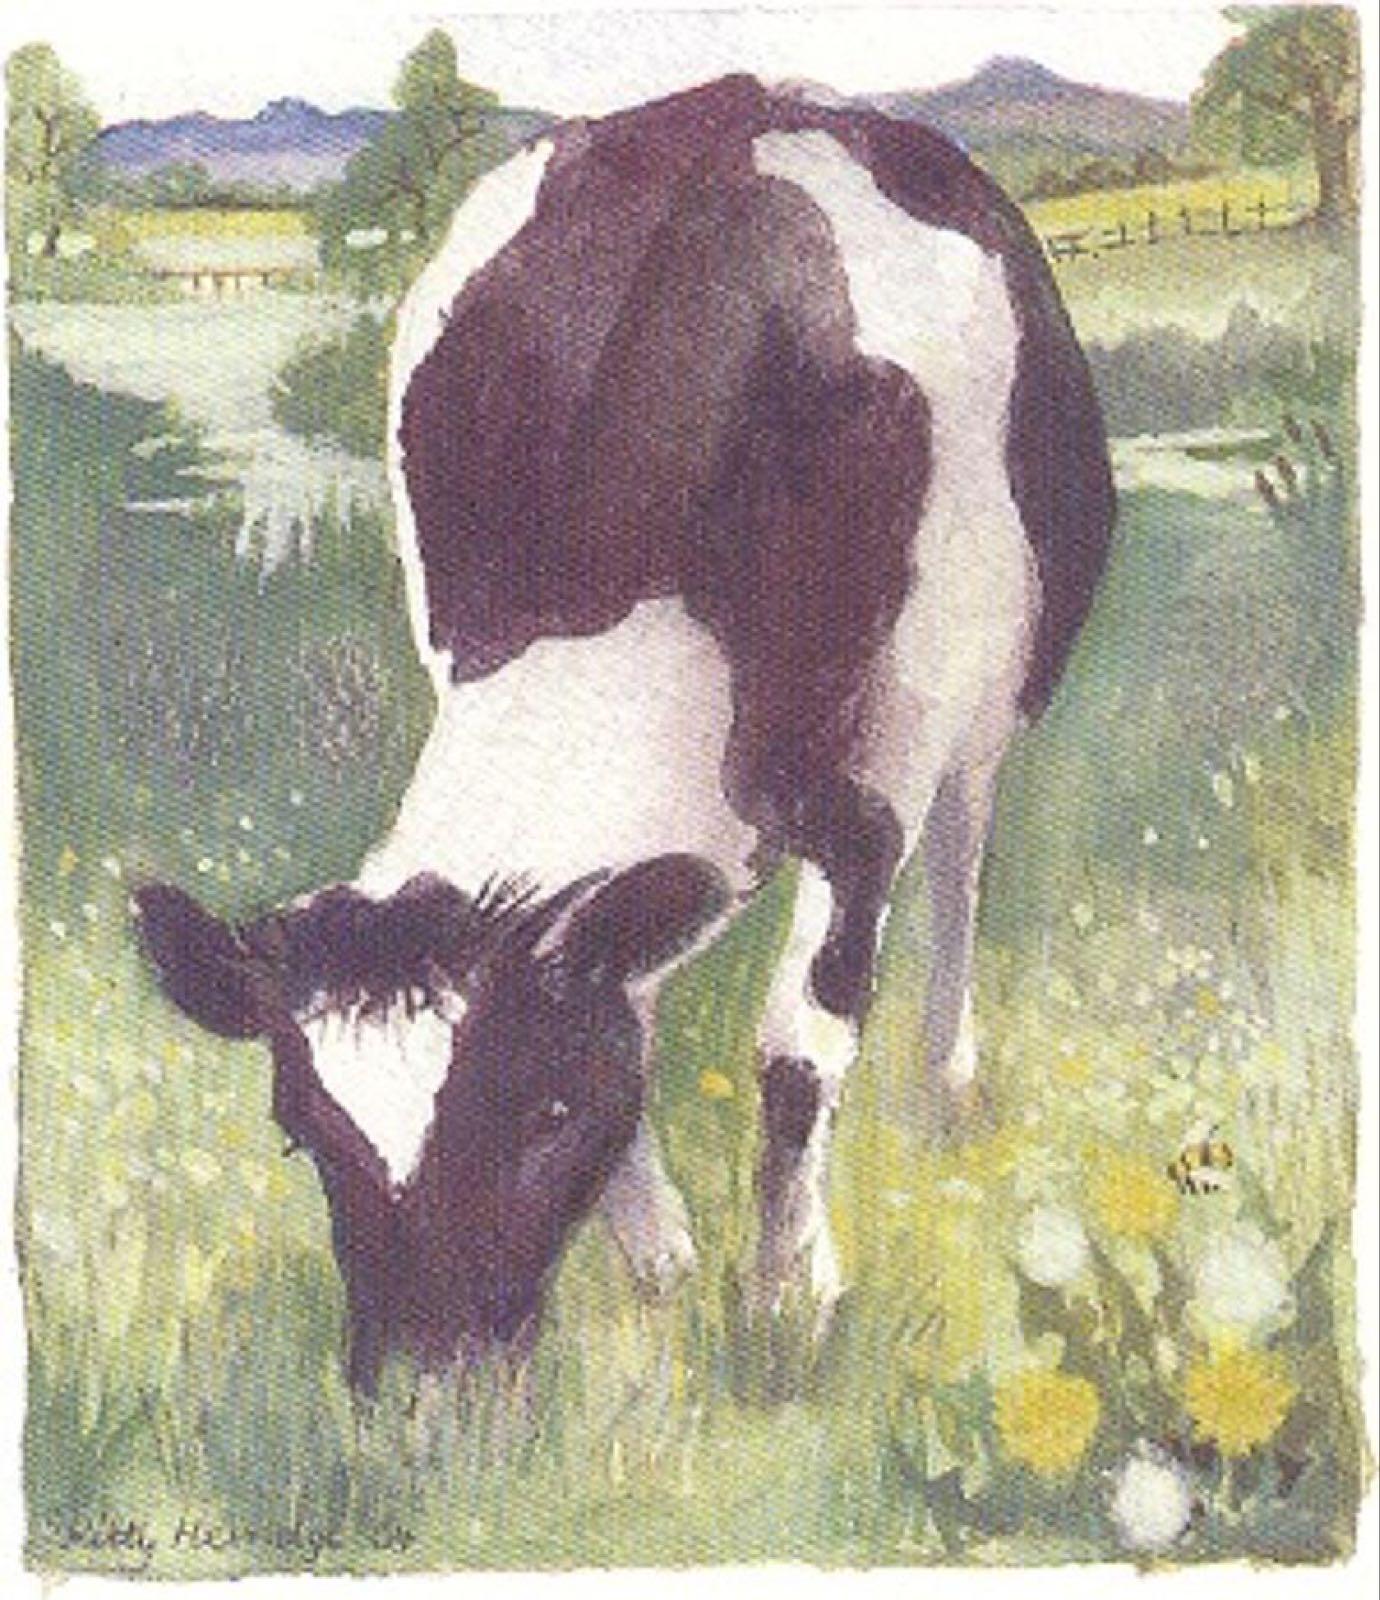 'Cow in the Meadow' Furzedown Gallery Mini Card